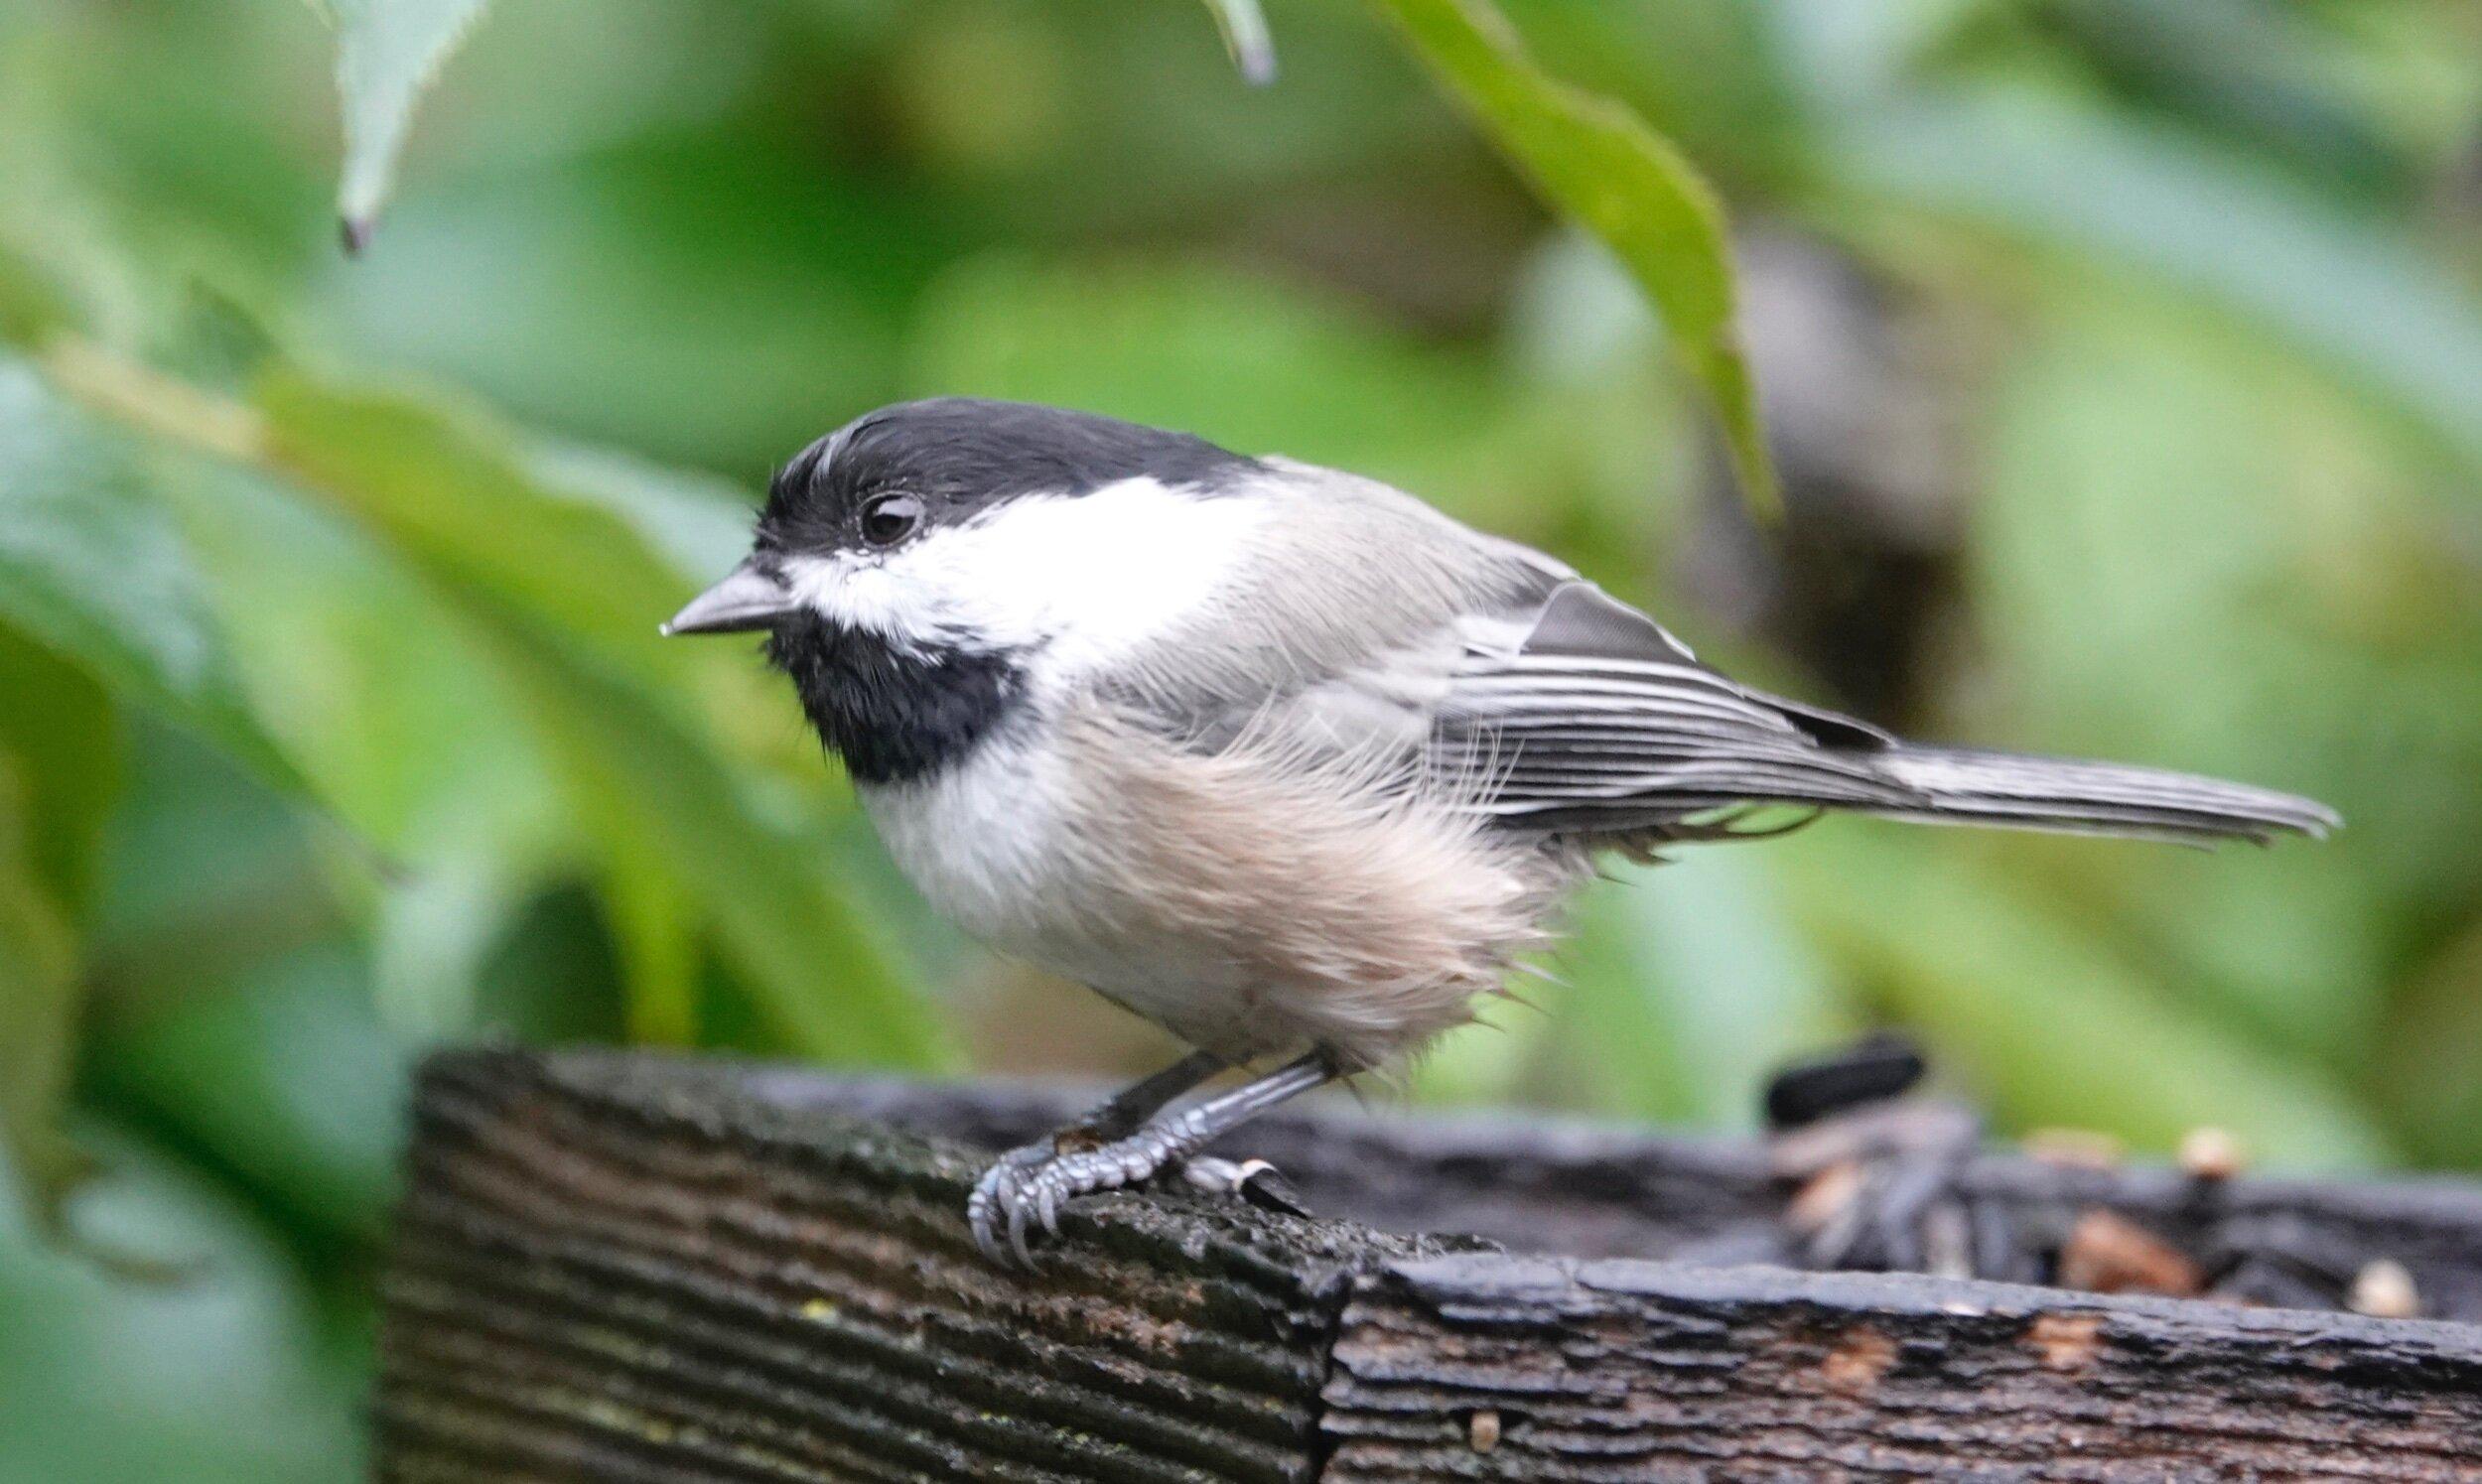 It's another rainy day chickadee.